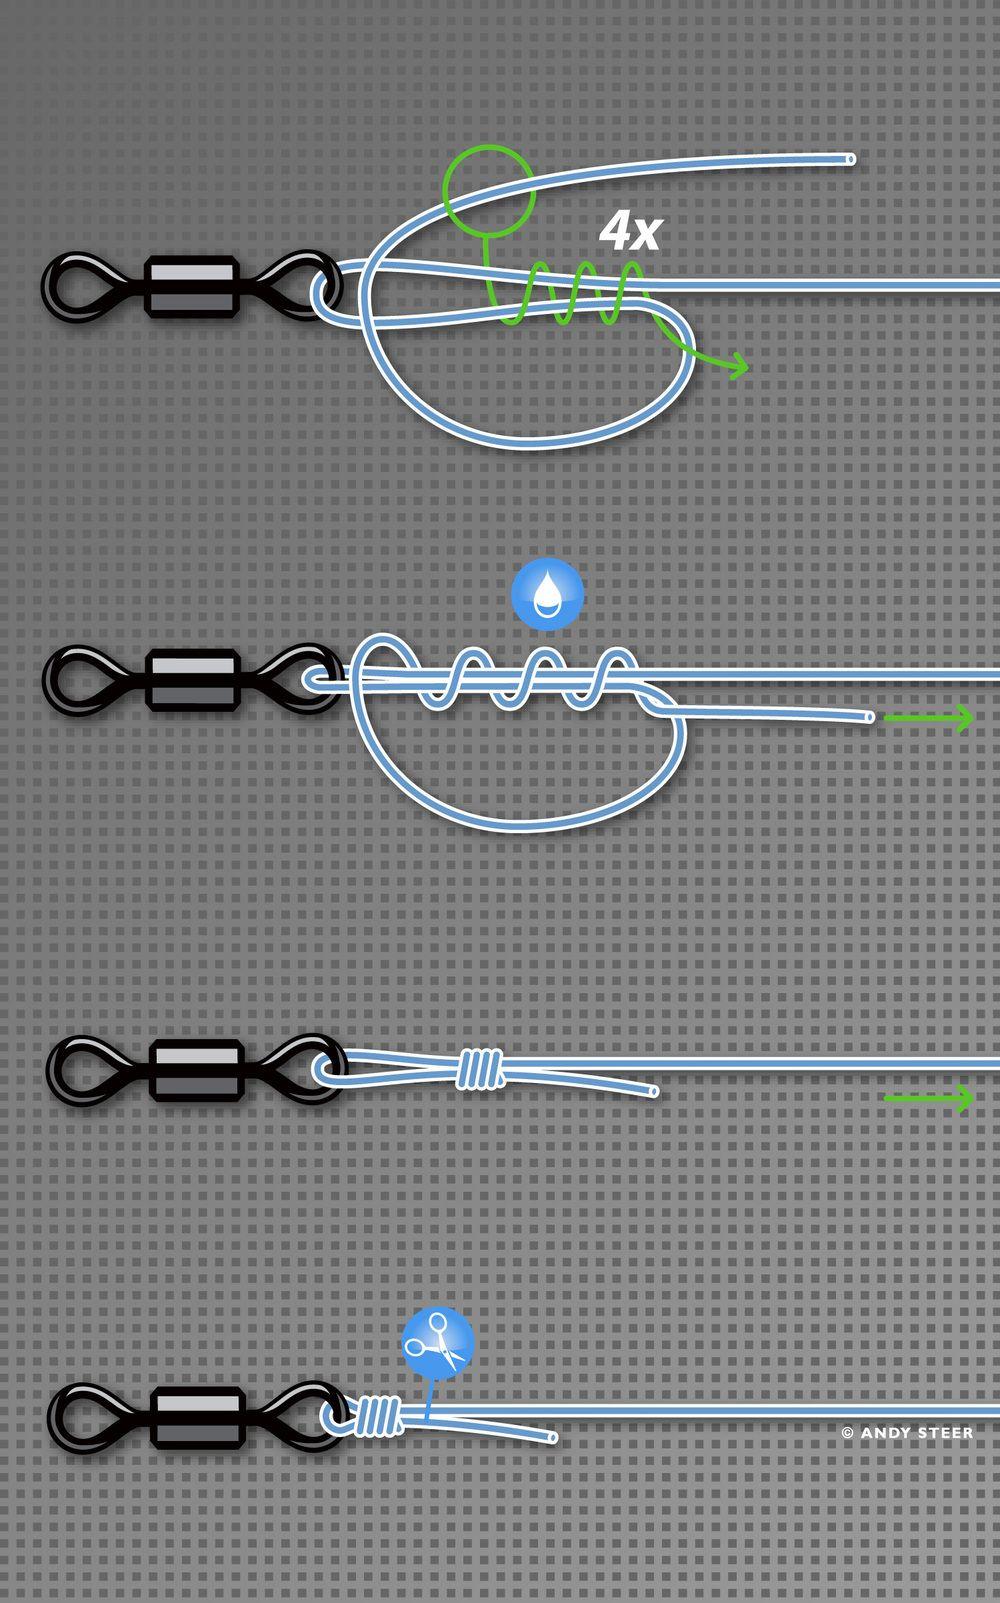 Ultimate Knots fishing lure knot for jewelry making | Biju ...